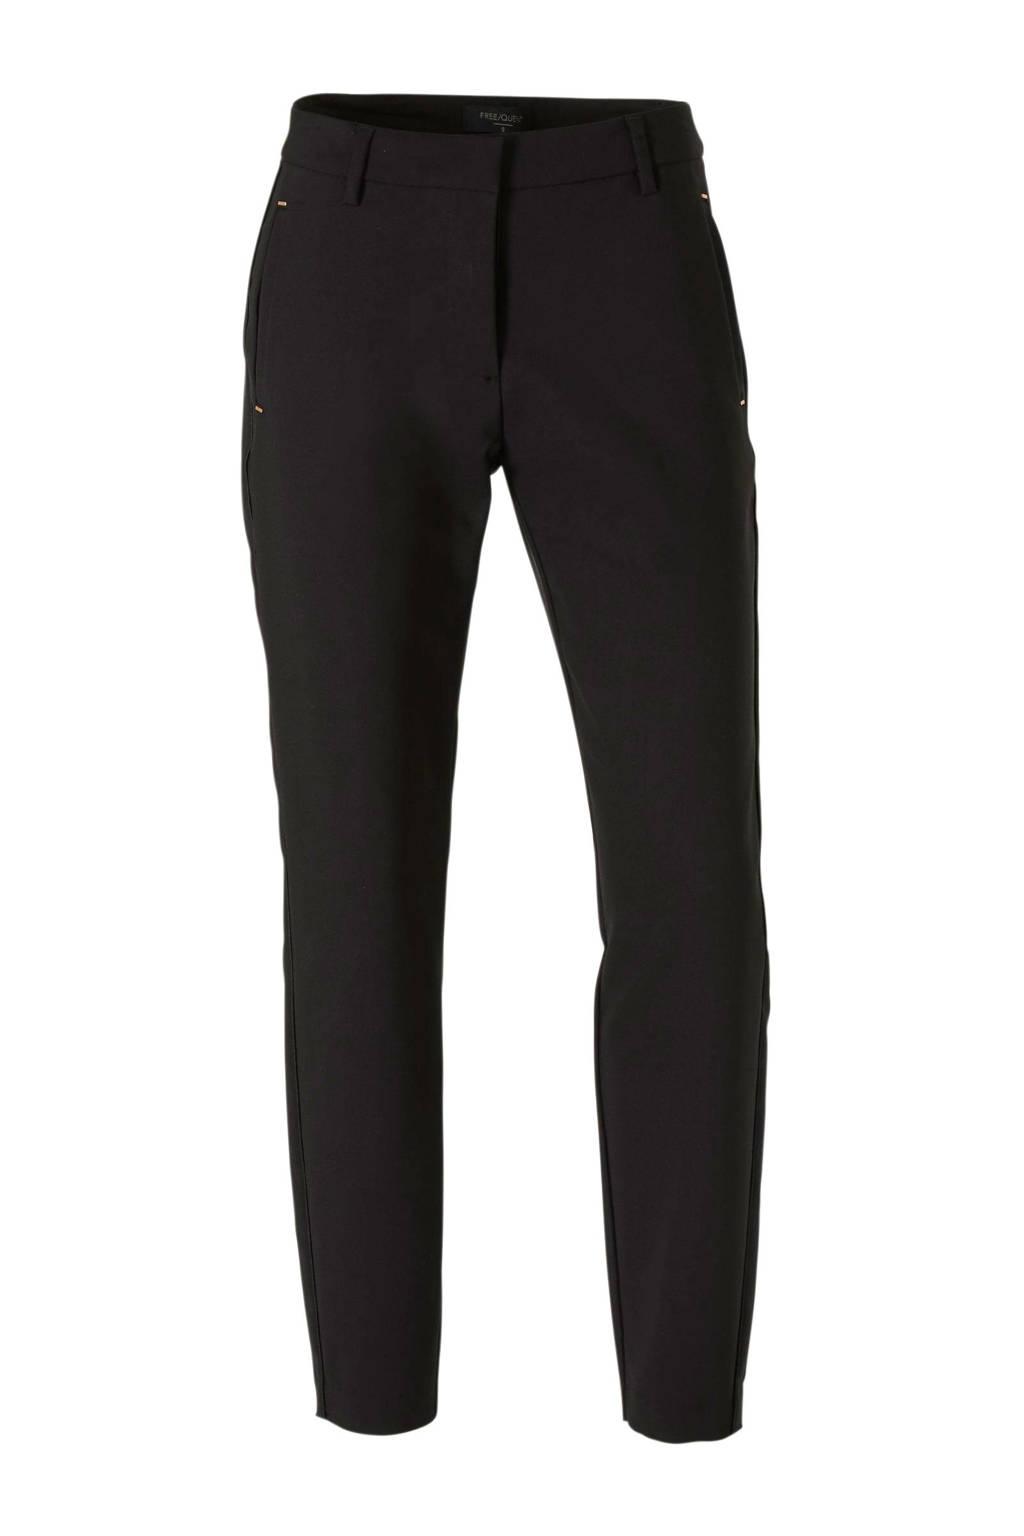 FREEQUENT tapered fit pantalon zwart, Zwart